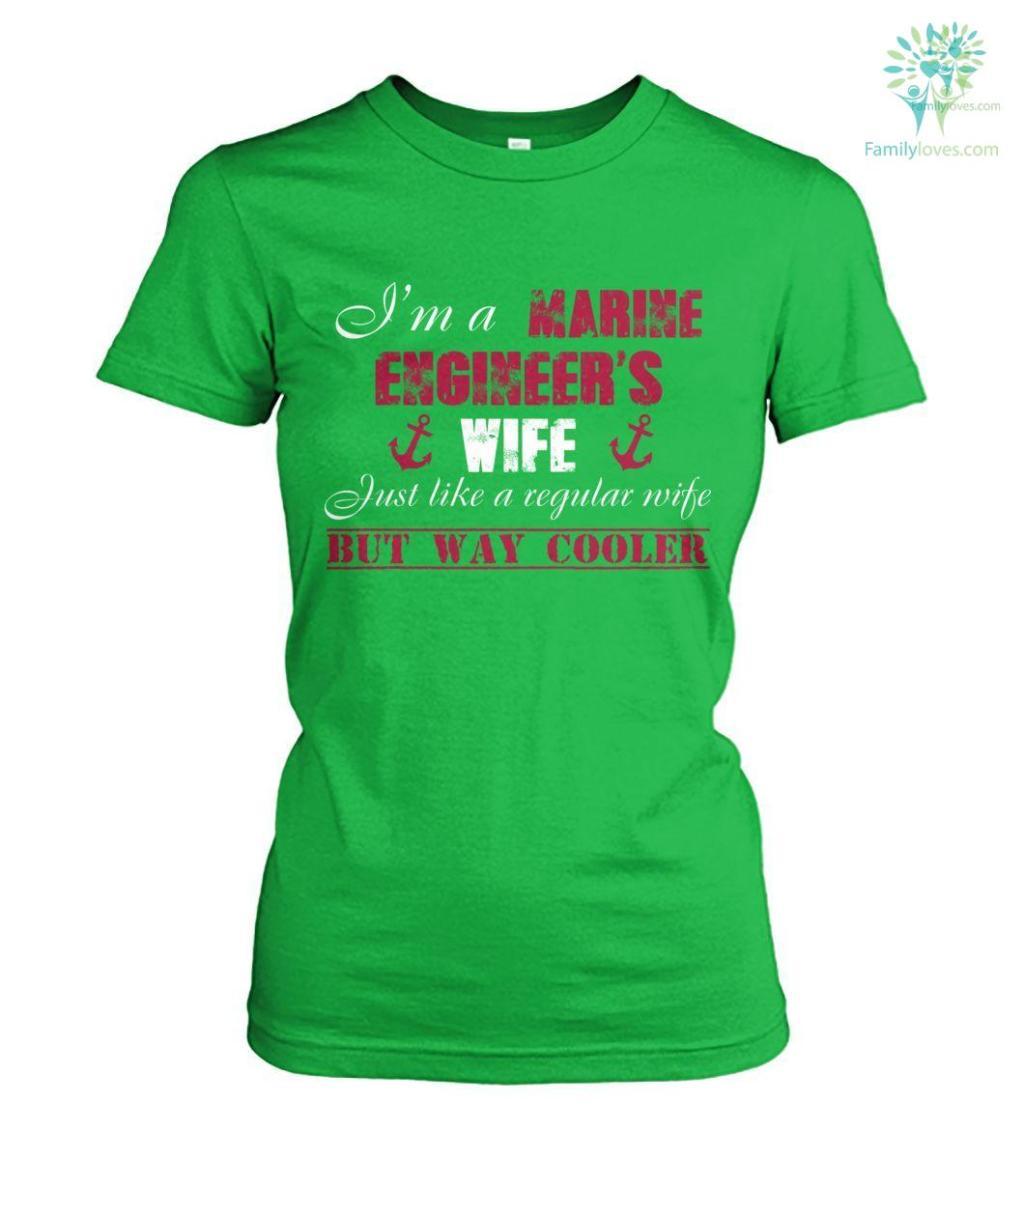 I'm a marine engineer's wife just like a regular wife but way cooler women t-shirt, hoodie Familyloves.com